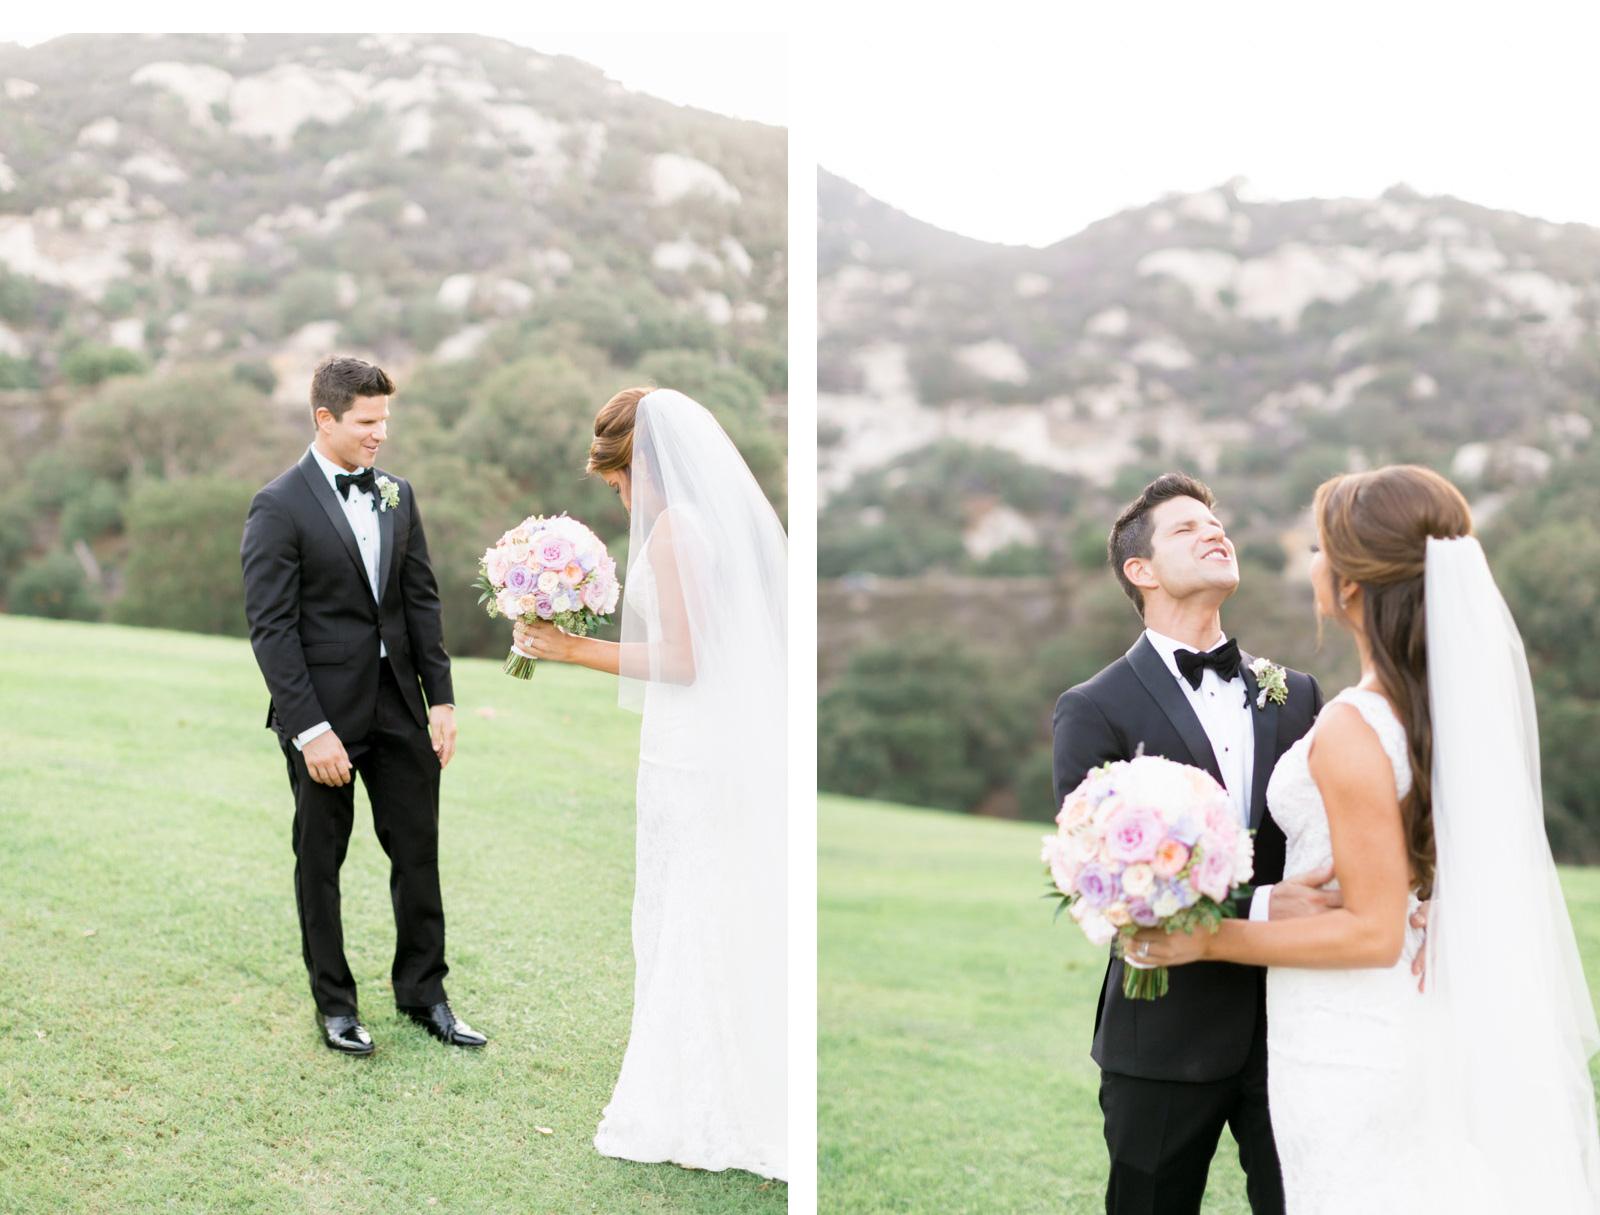 Daniel-and-Nia-Booko-Wedding_06.jpg